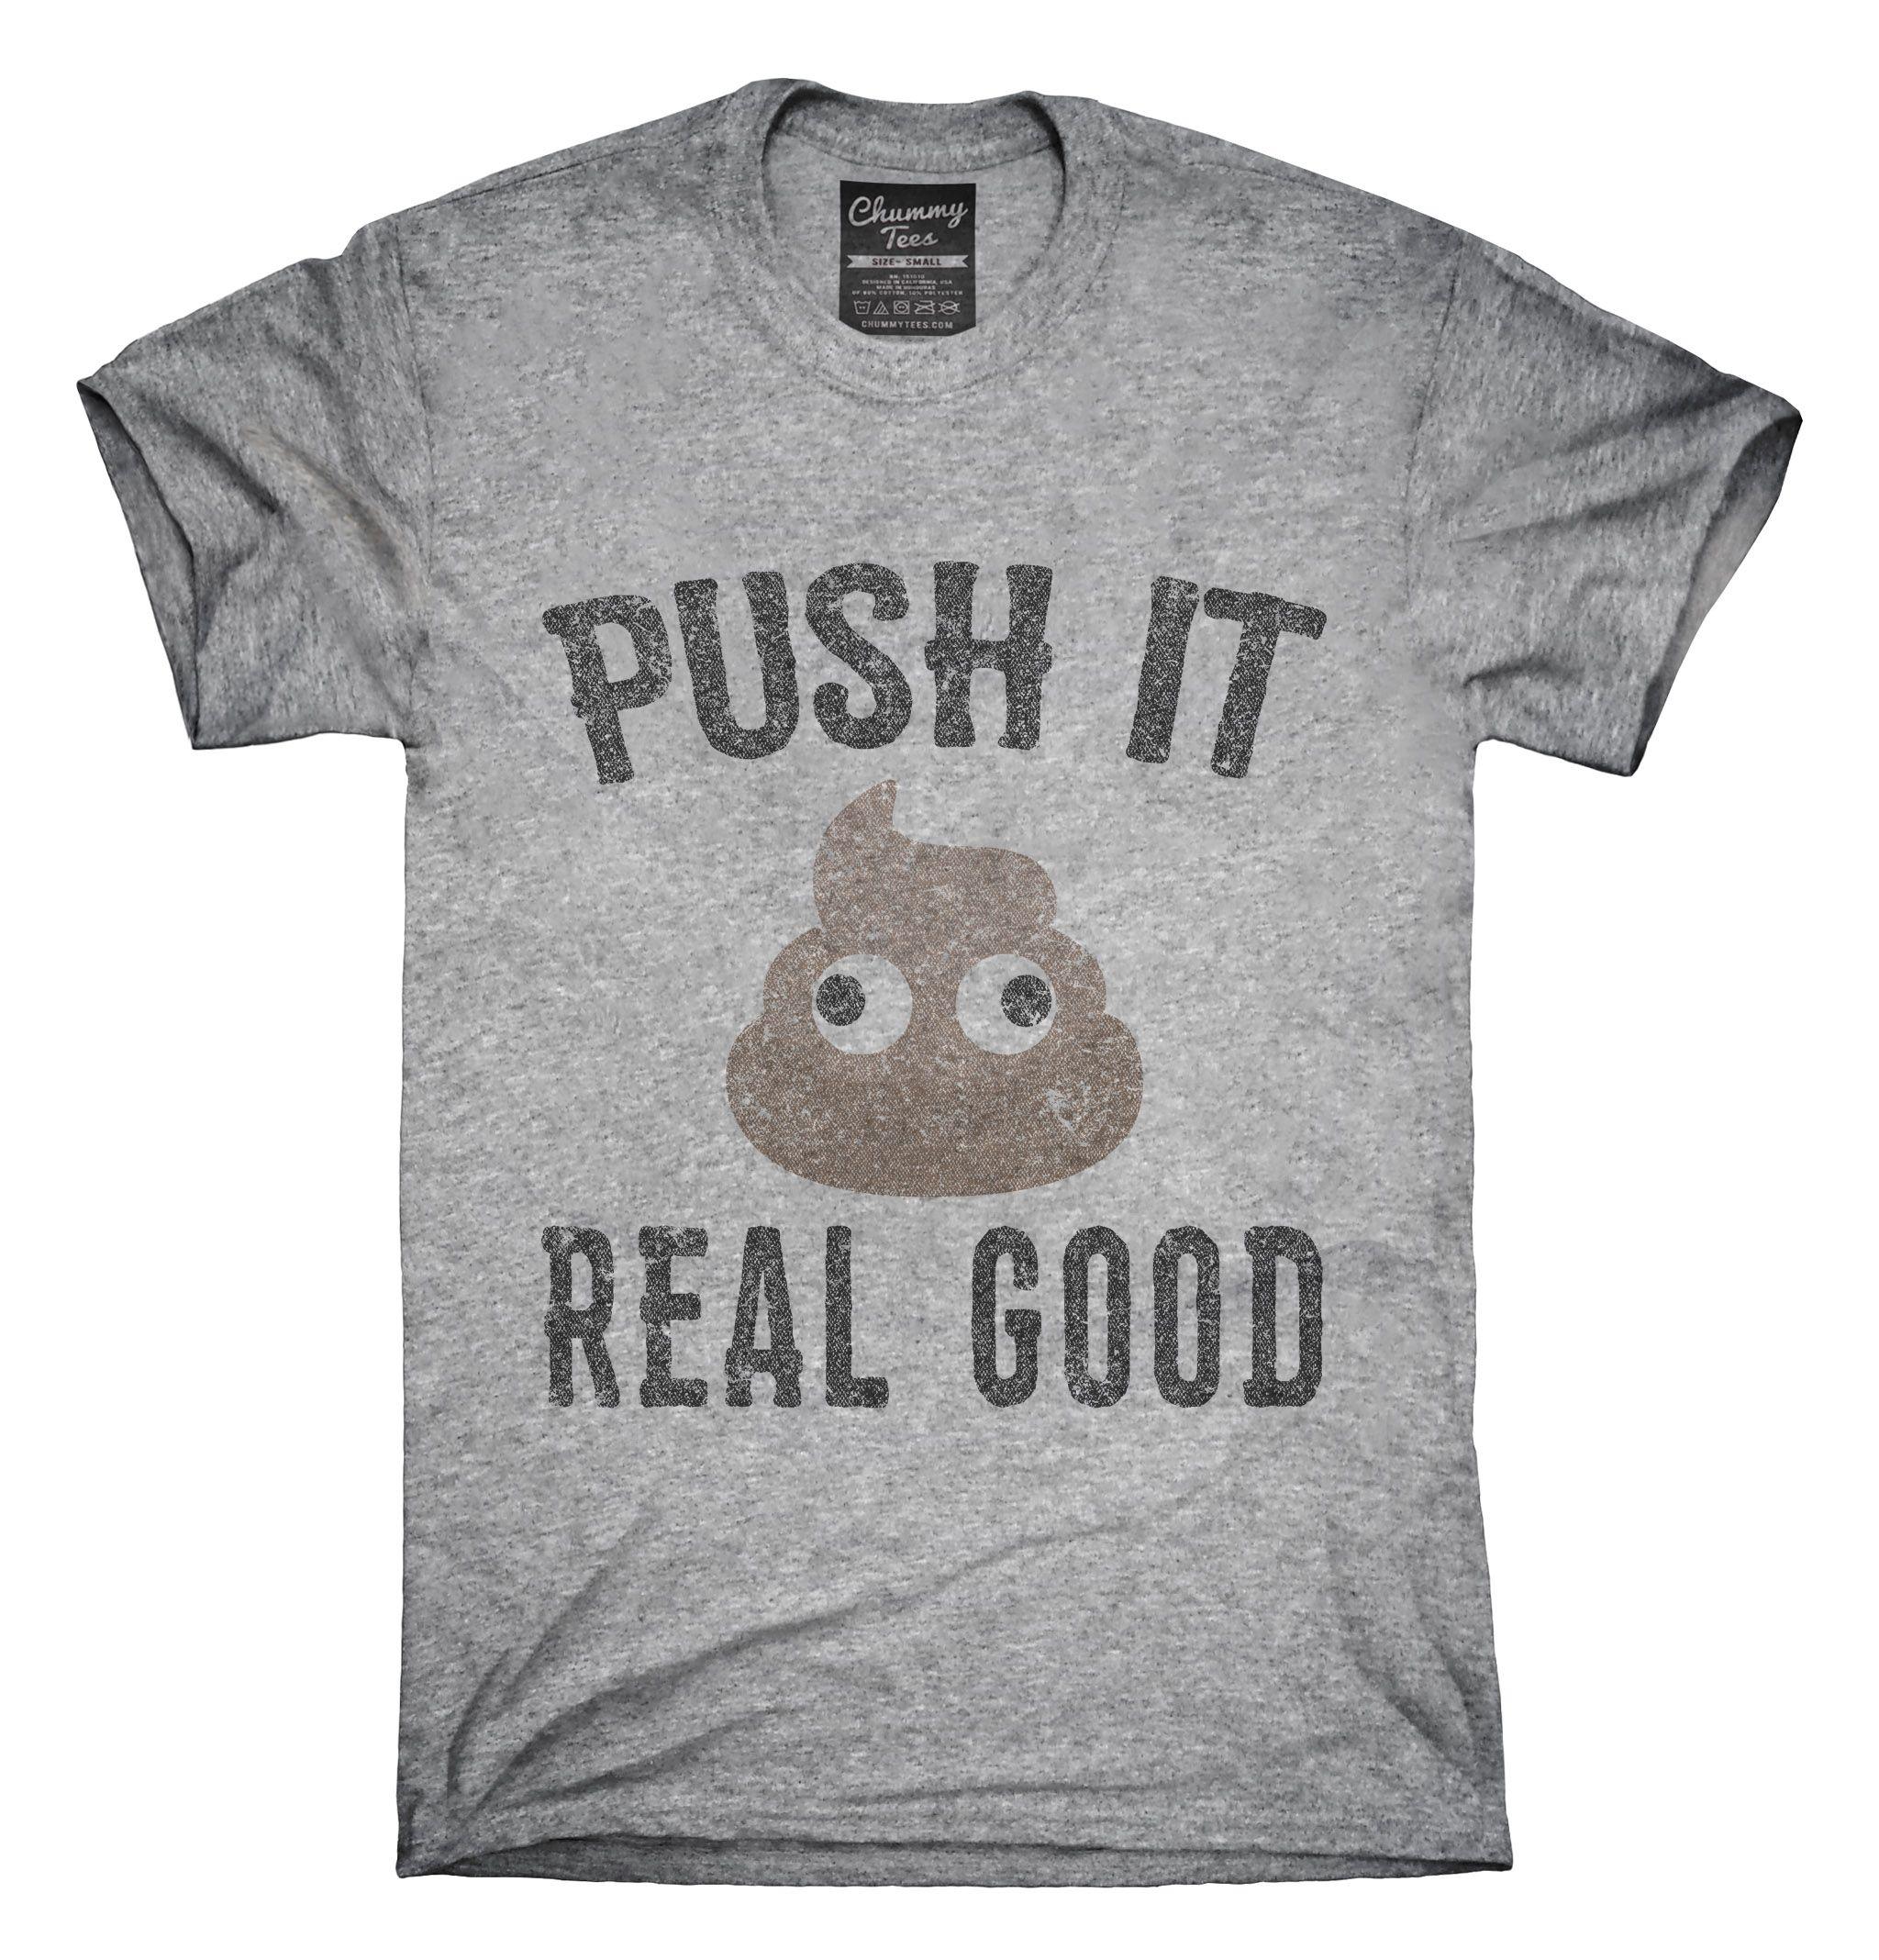 Funny Poop Emoji Push It Real Good T-Shirt, Hoodie, Tank Top